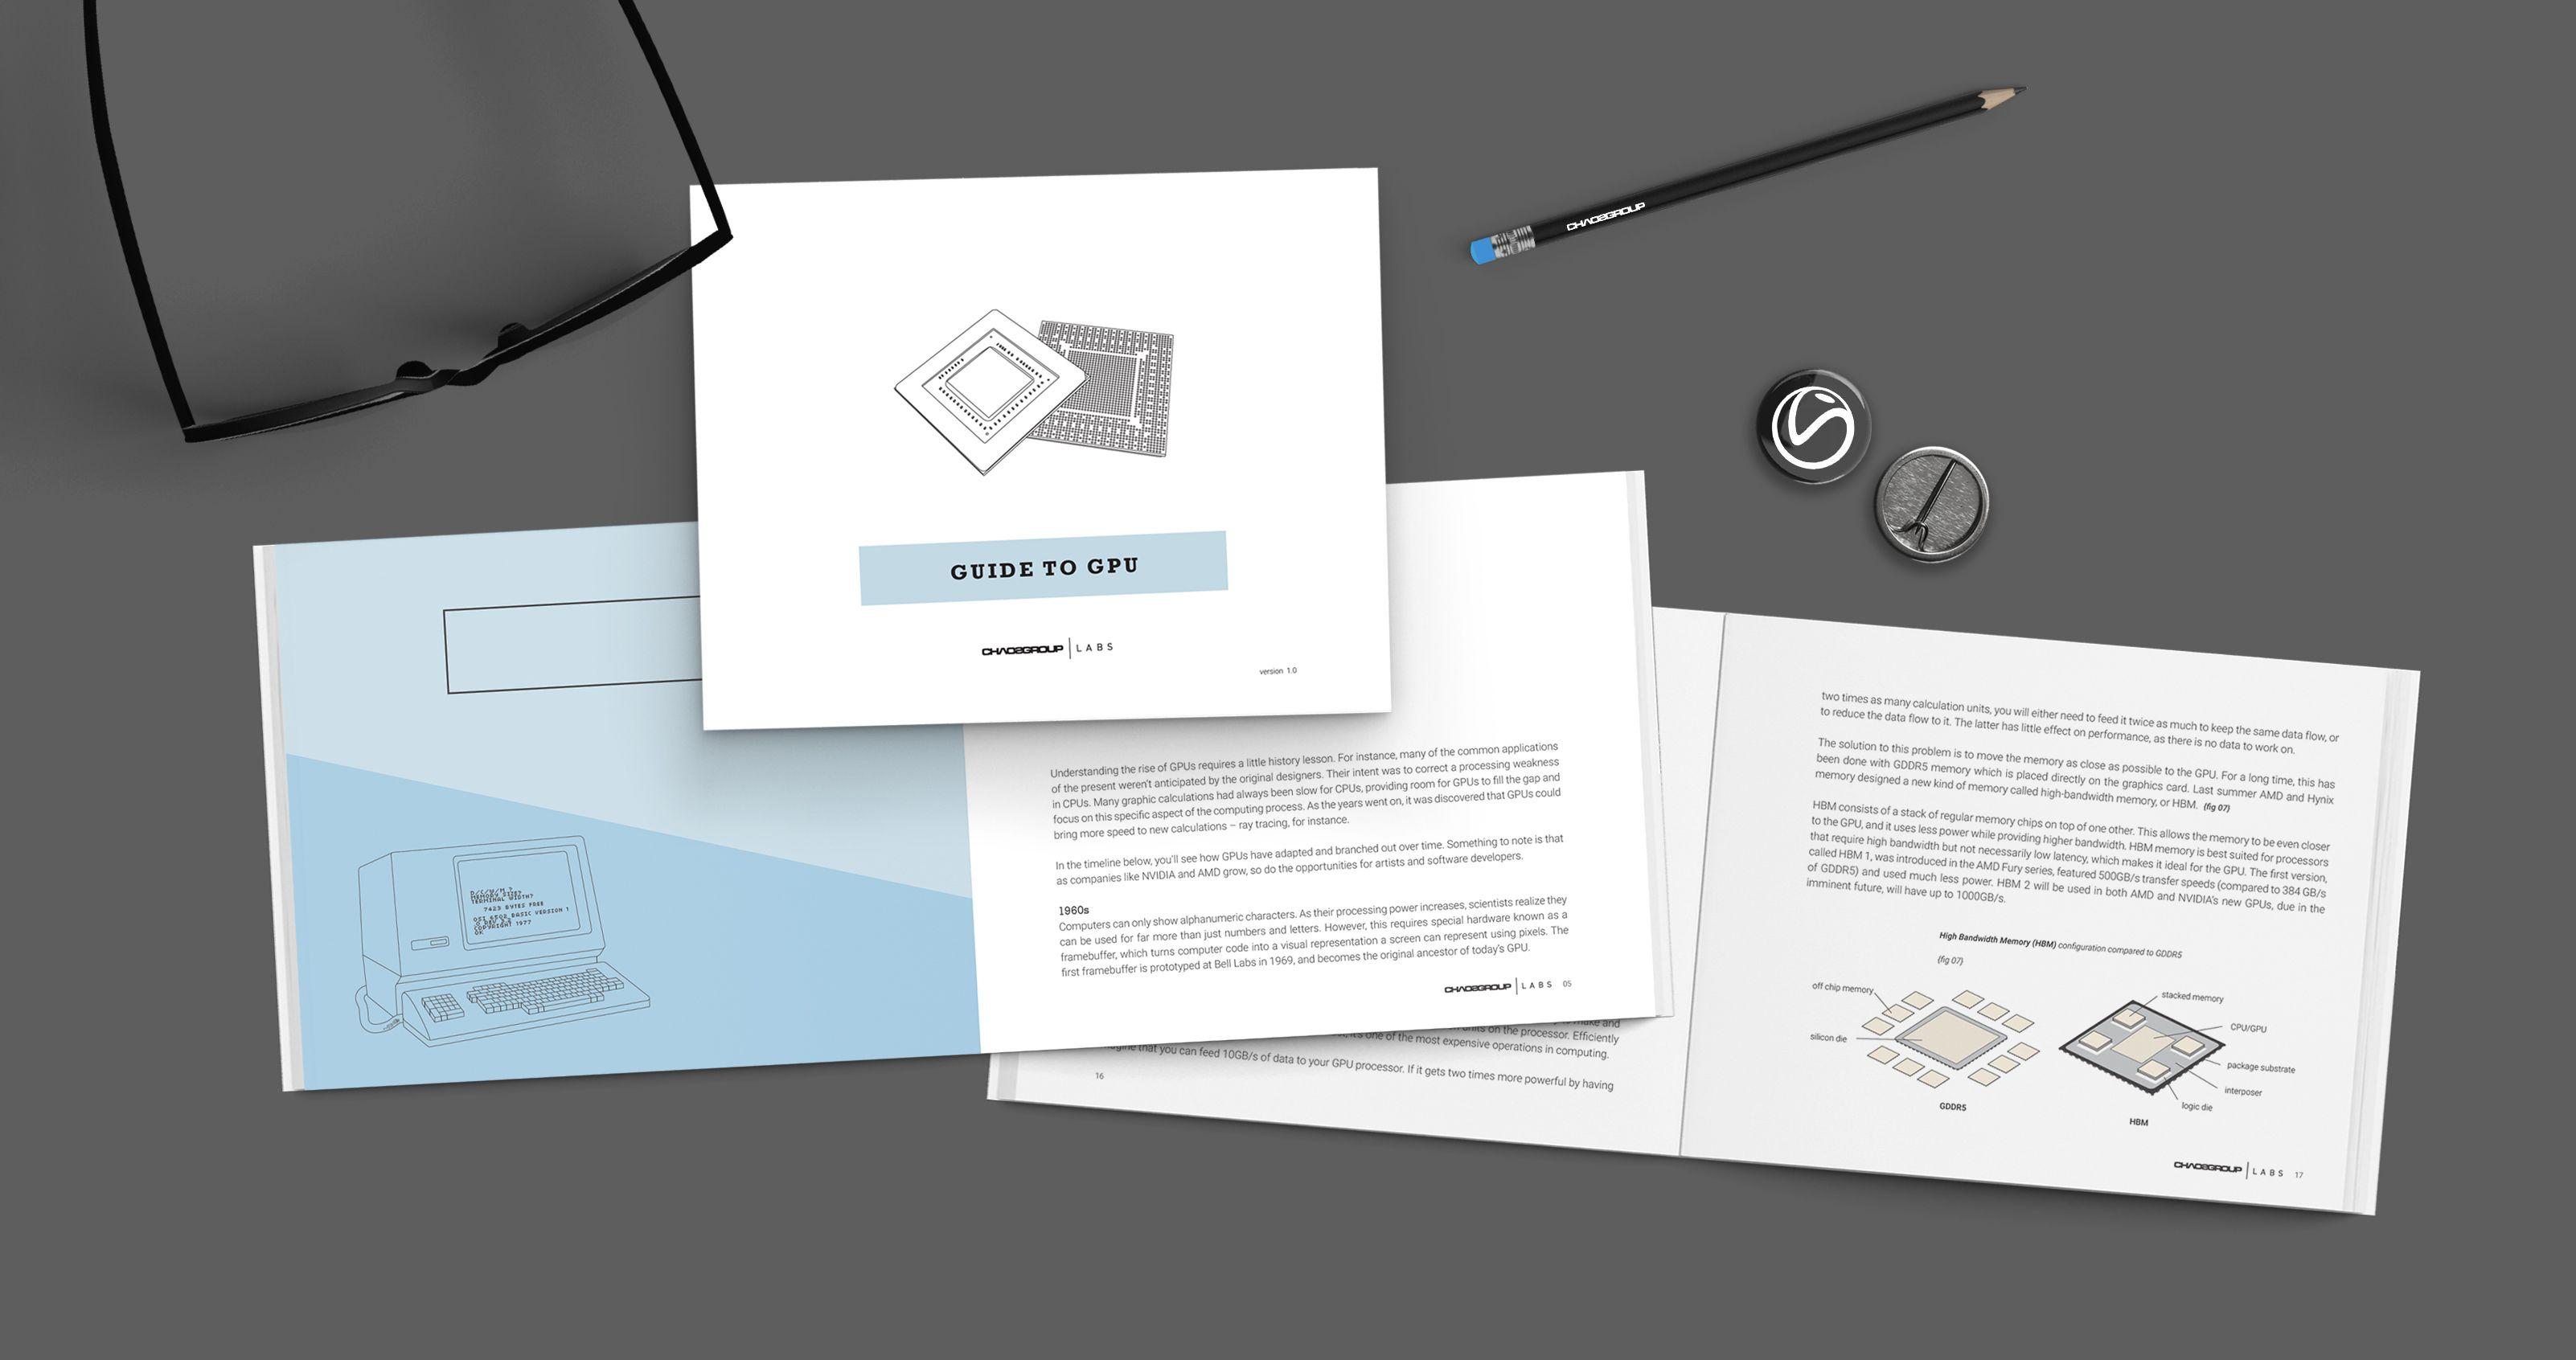 Guida al gpu rendering gratis su chaos group labs for Programmi rendering gratis